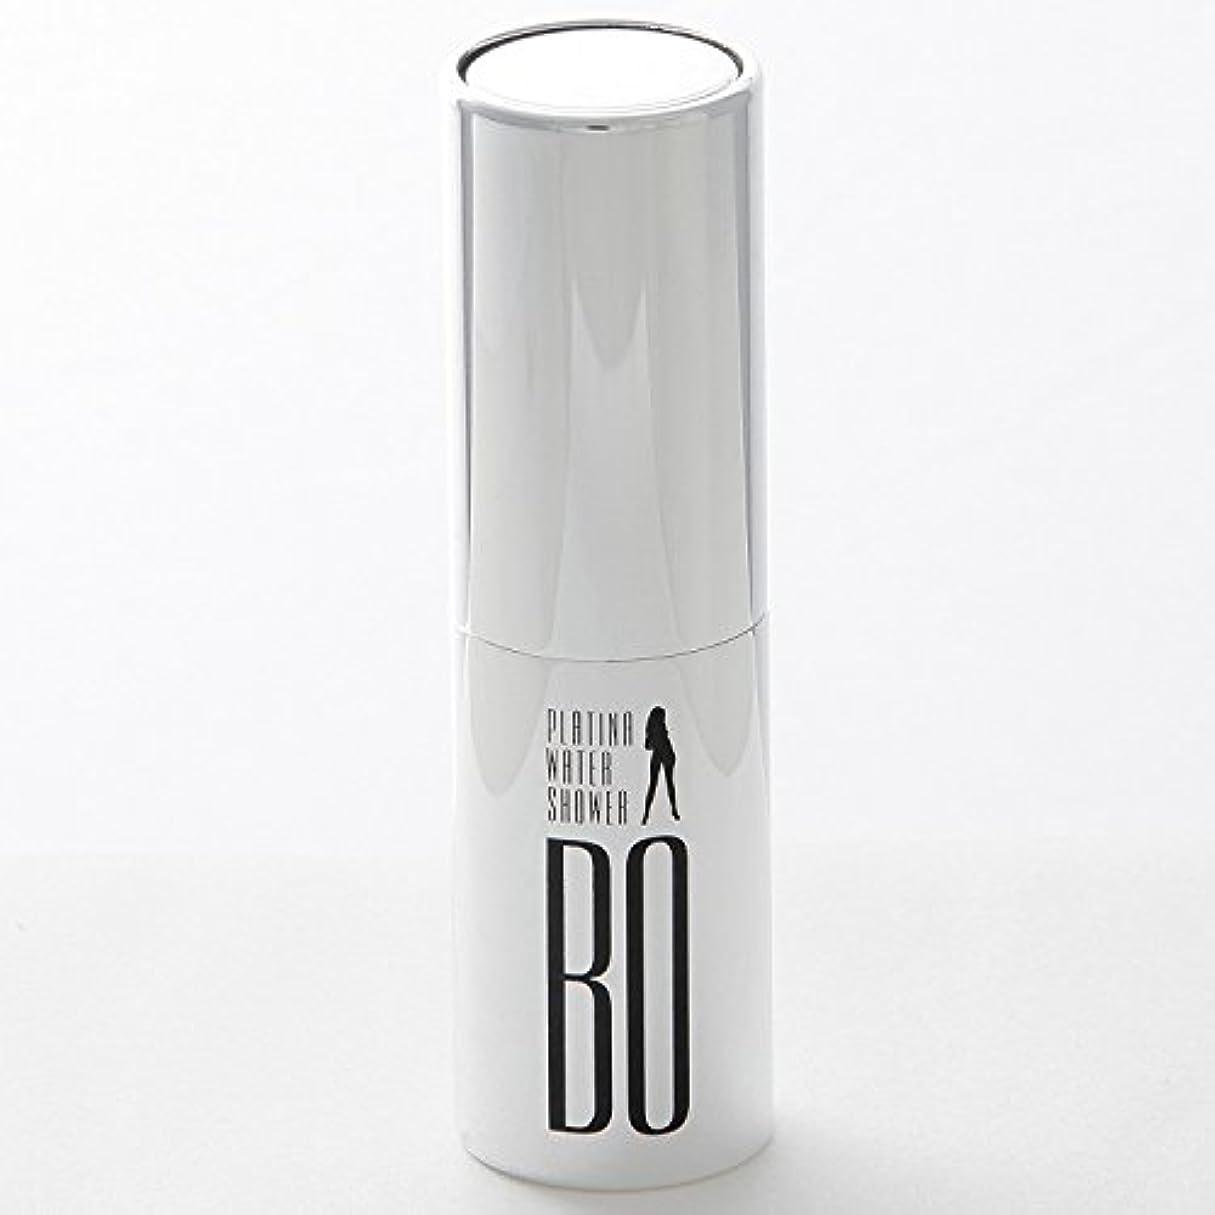 BO PLATINA WATER SHOWER 20ml ナノプラチナ 消臭 除菌99.9% ニオイ戻りゼロ ヘアートリートメント